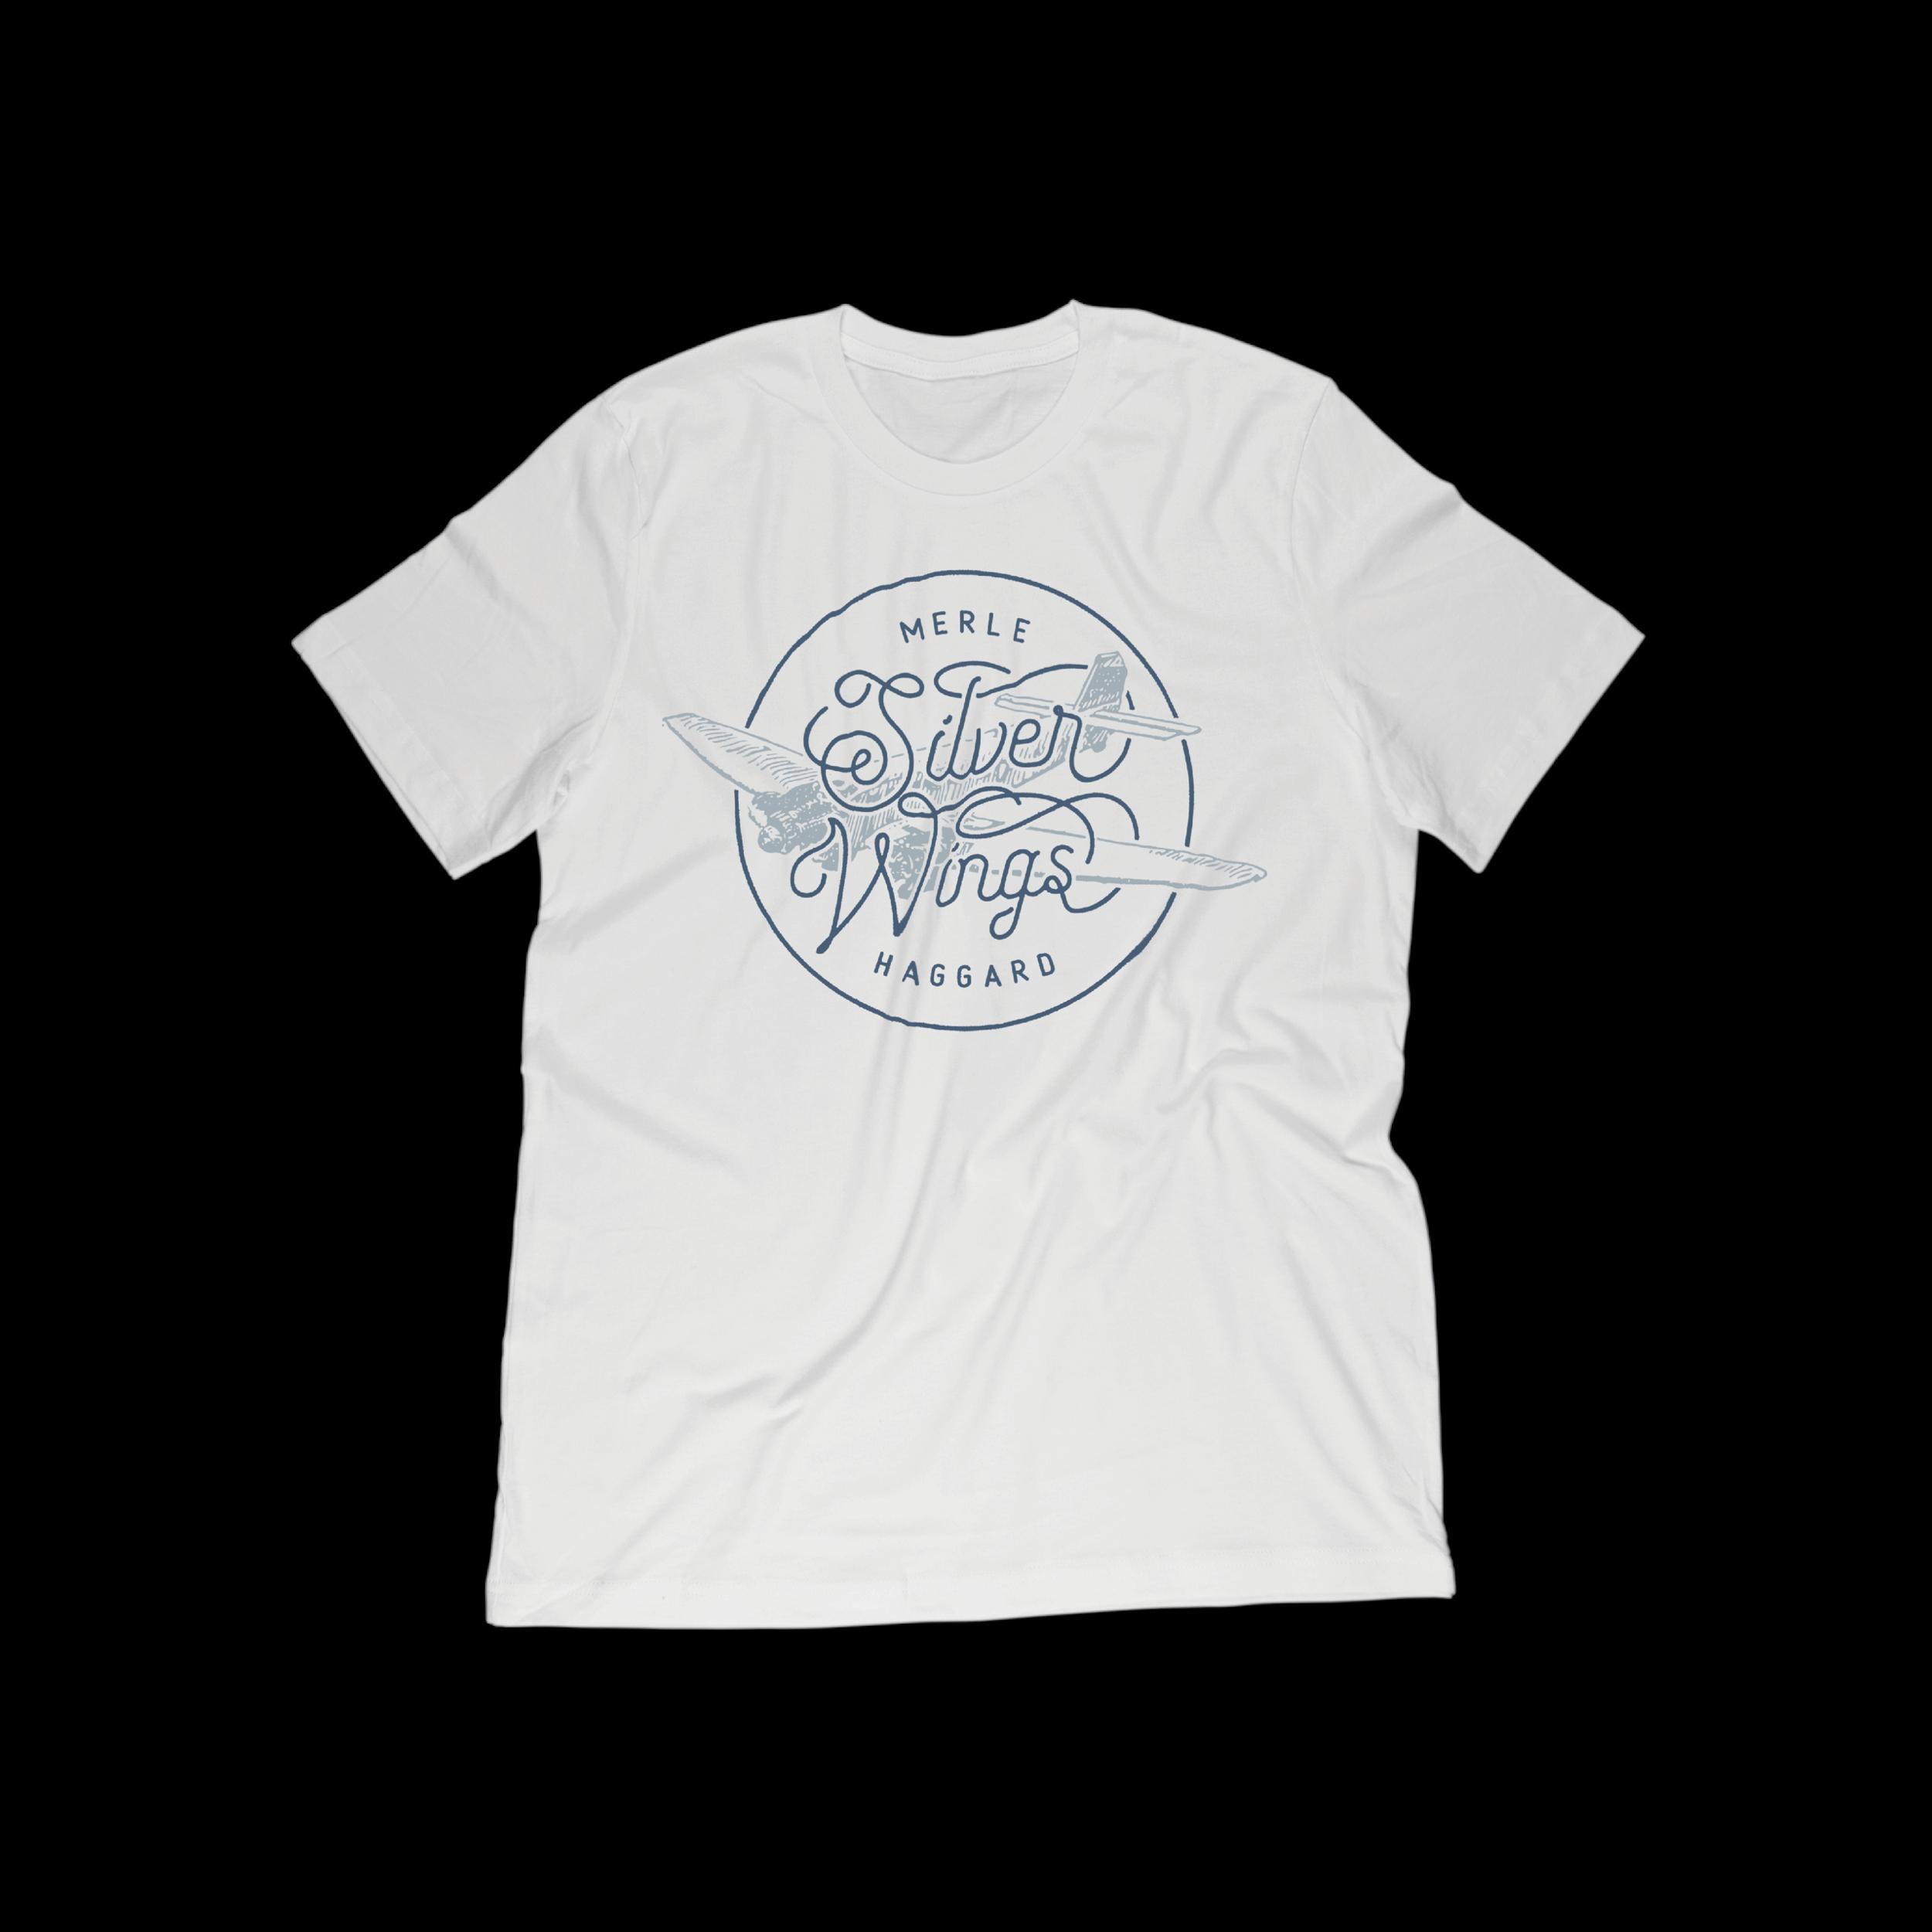 MerleHaggard-MockUps-052719.png